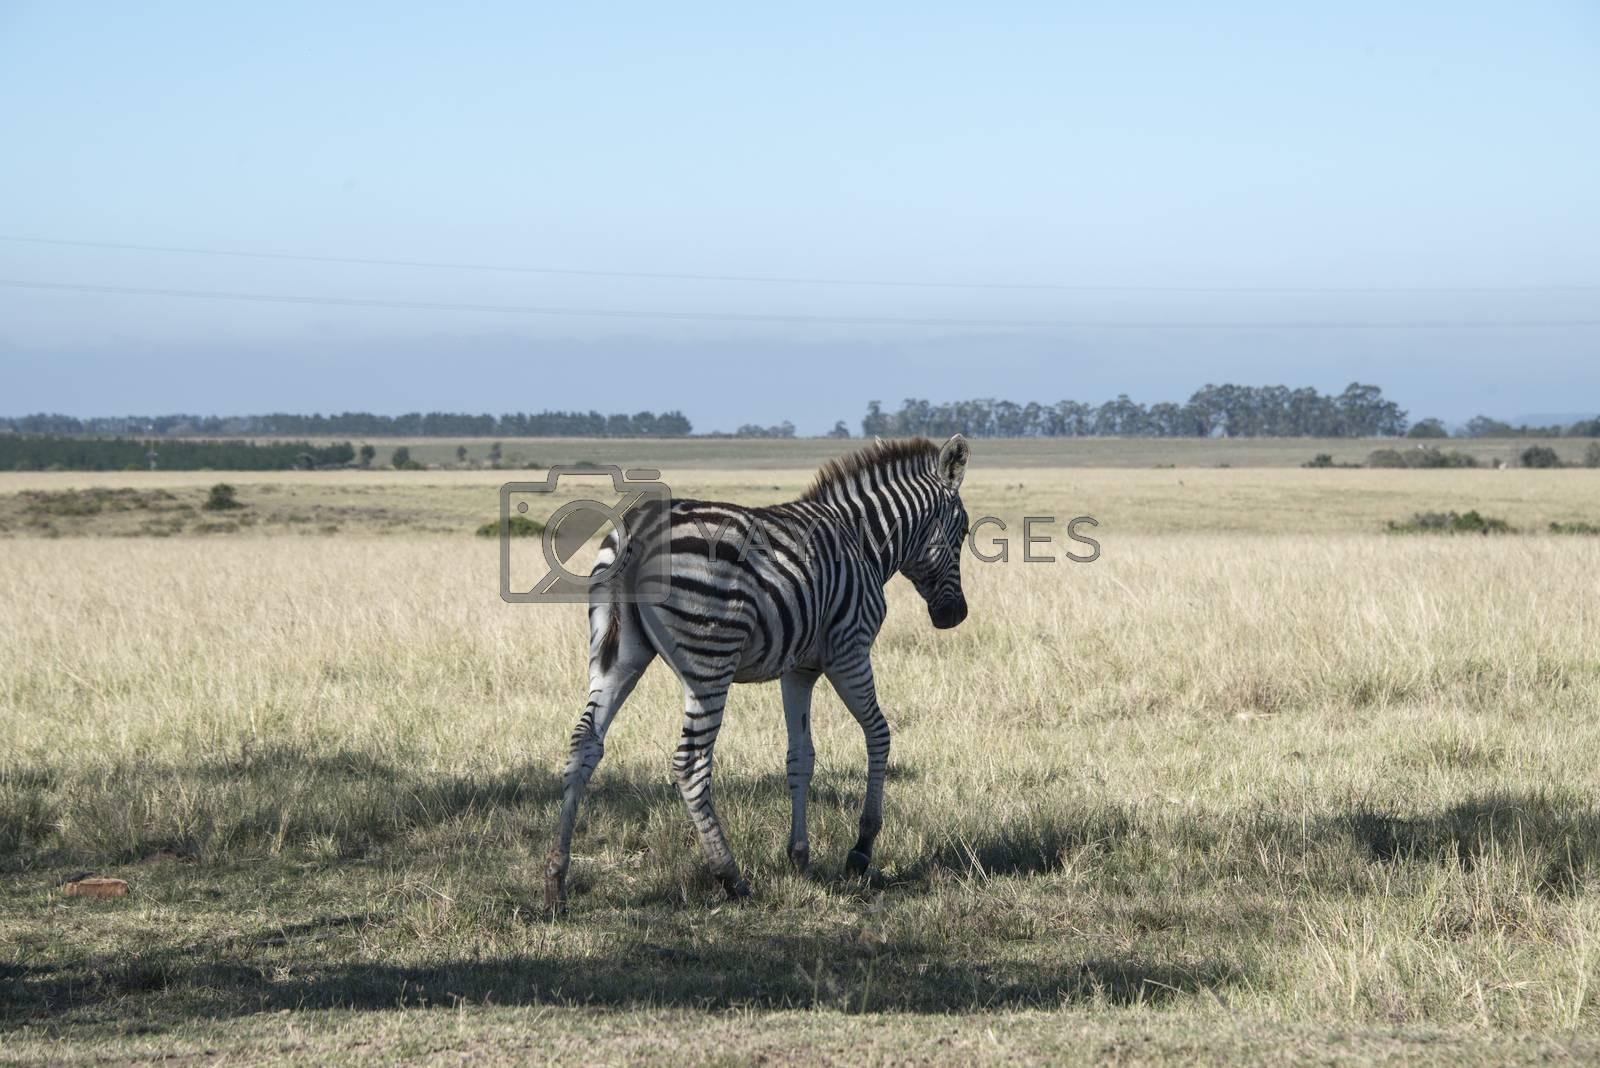 A young zebra walking across a plain, South Africa